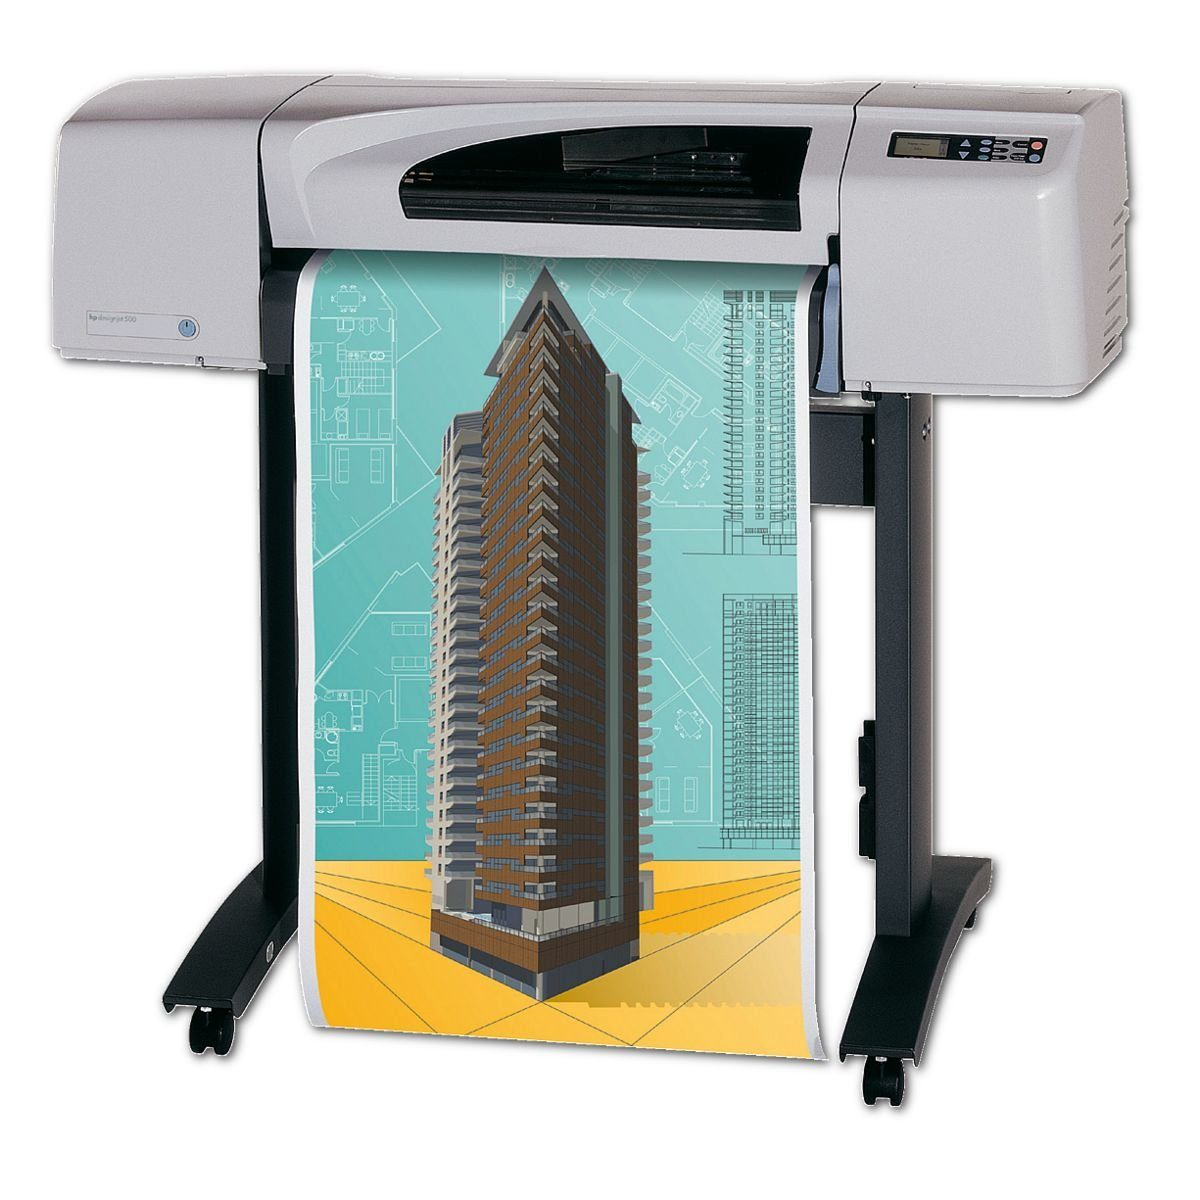 POWERJET Plotter-Papier 90 g/m² 610 mm x 90 m »CAD Premium matt«